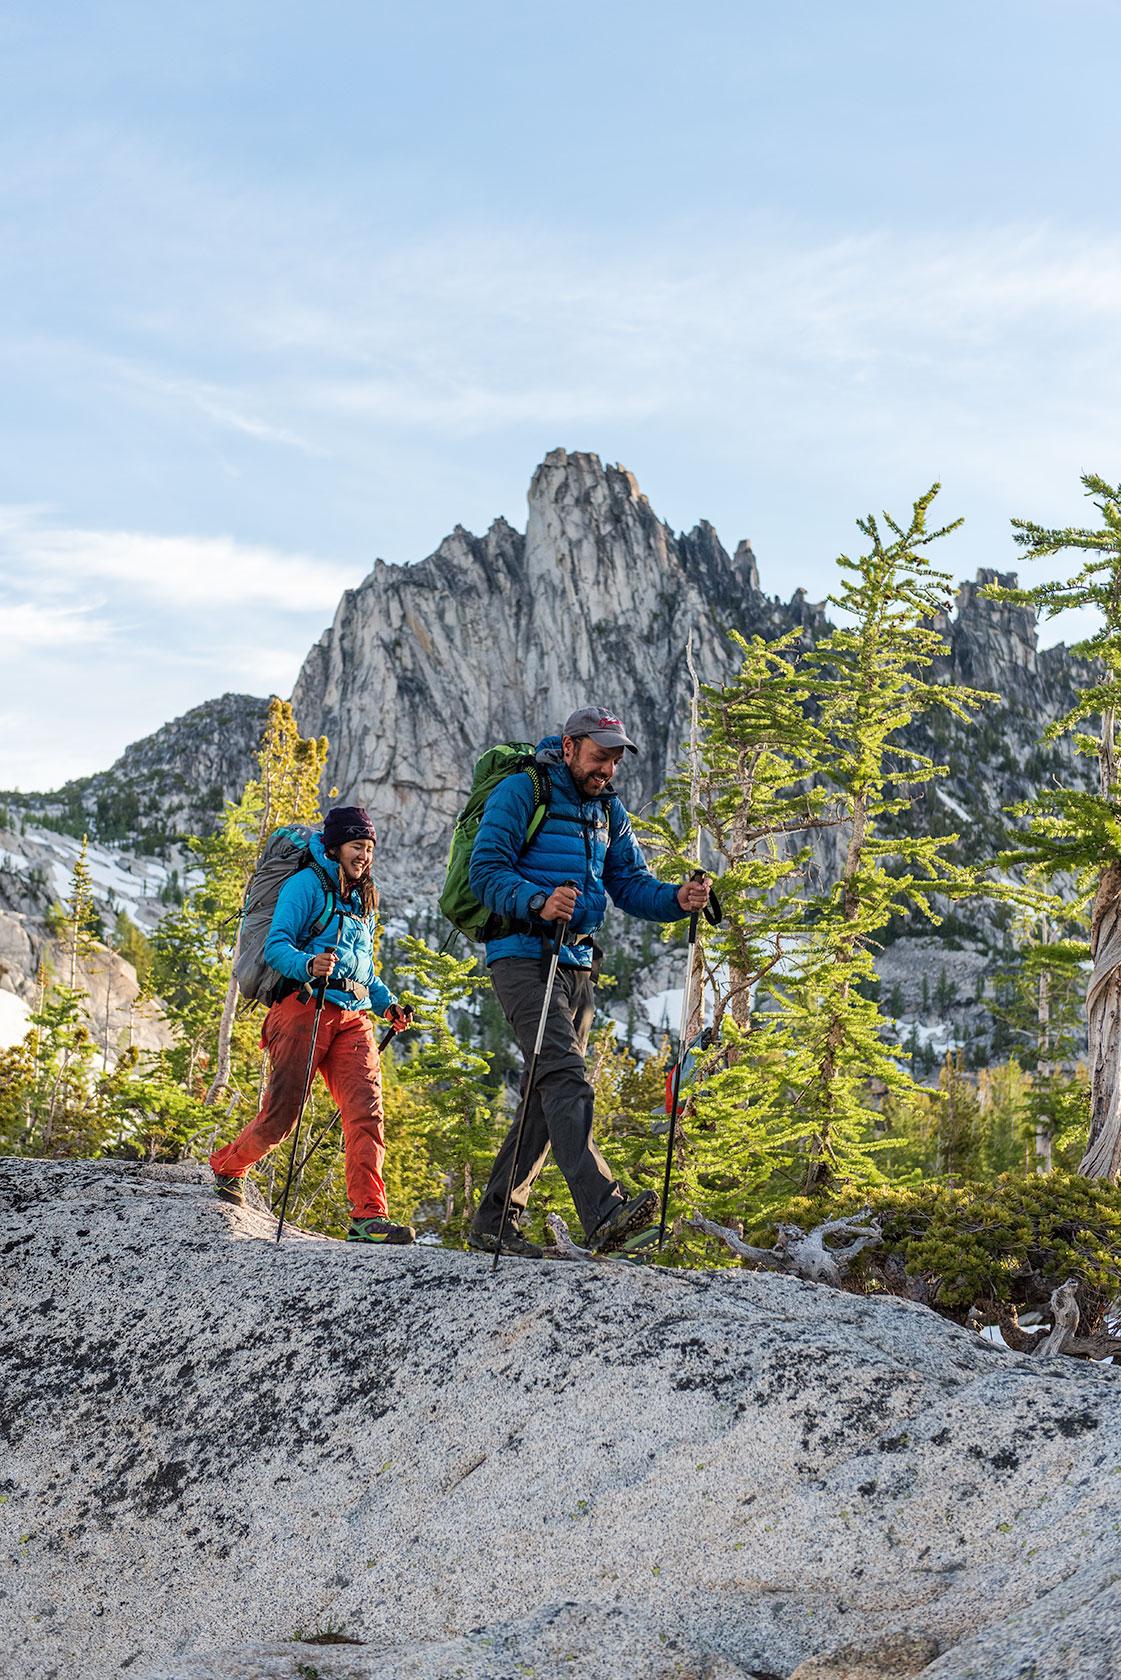 austin-trigg-osprey-hiking-backpacks-hike-camp-washington-adventure-morning-sunrise-lifestyle-outdoor-enchantments-prusik-alpine-lake-larch-tree.jpg